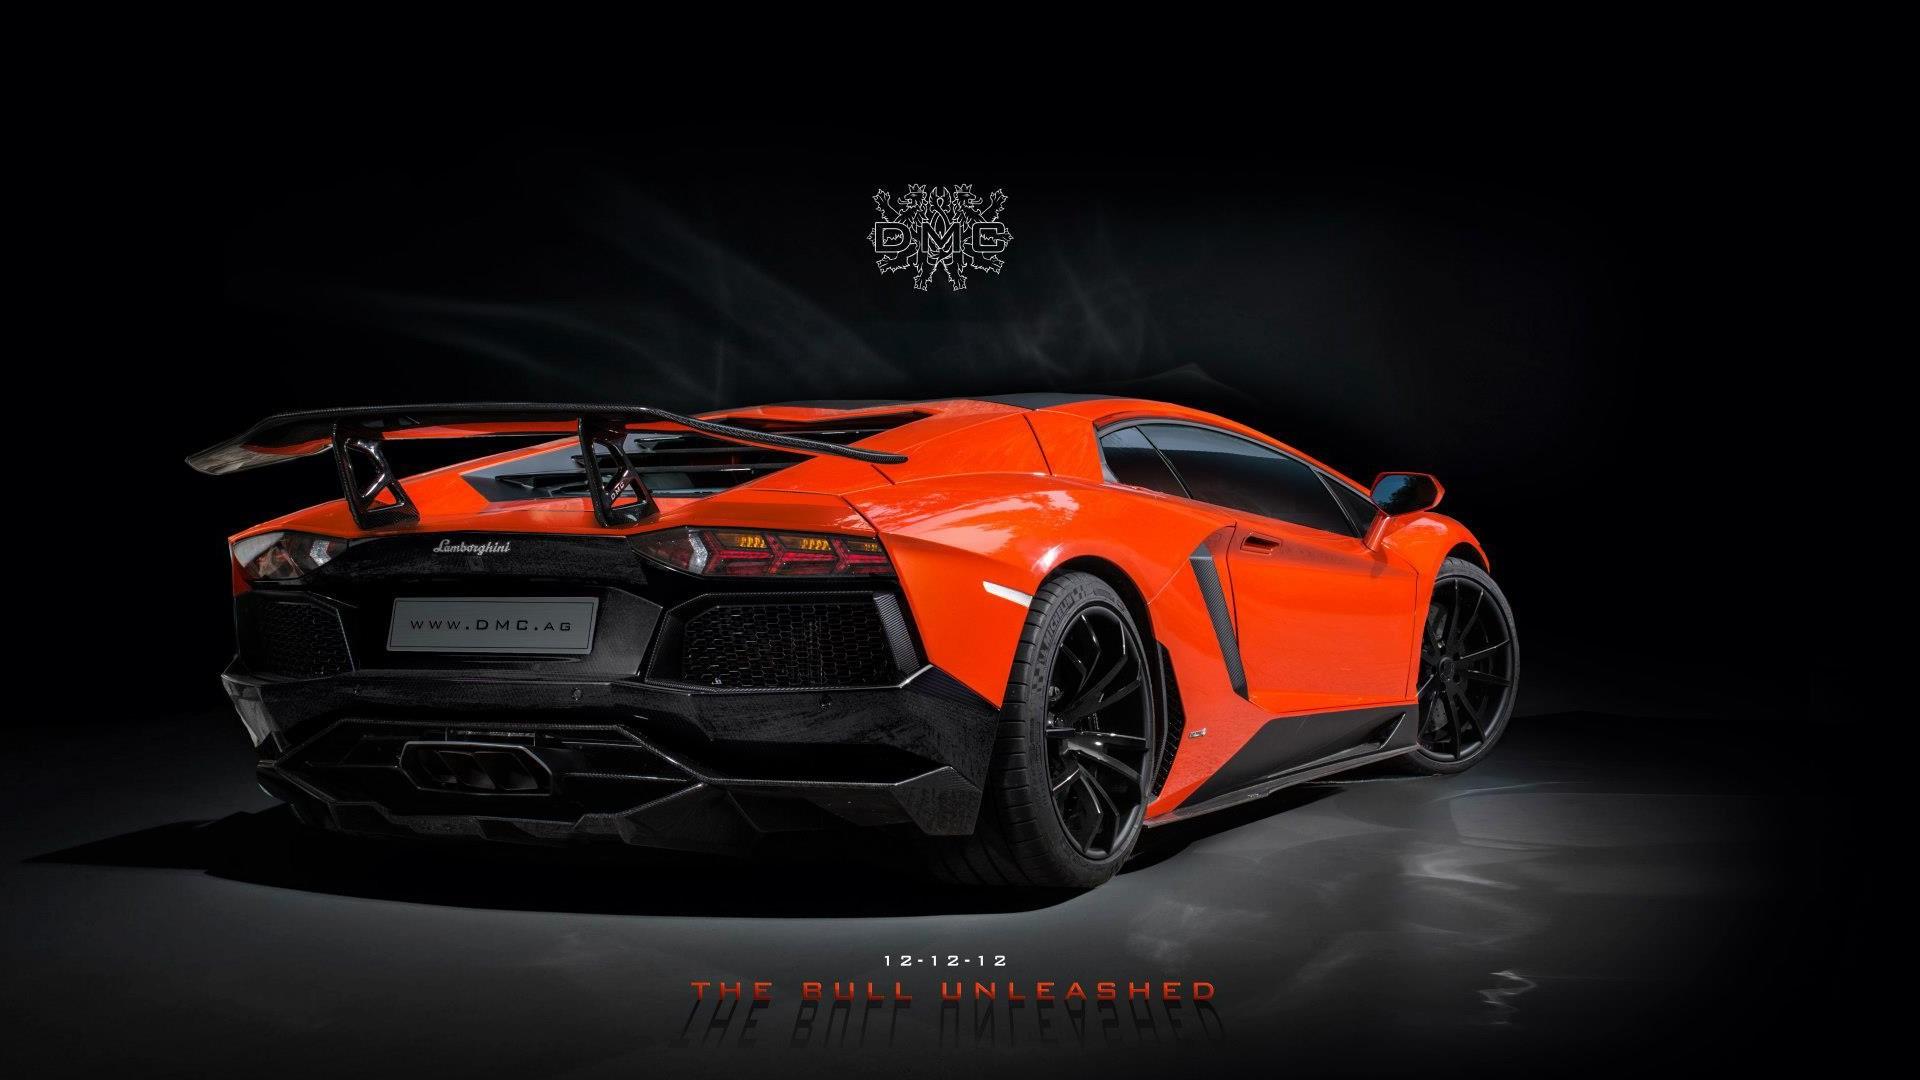 Lamborghini Reventon Wallpaper 2018 61 Images